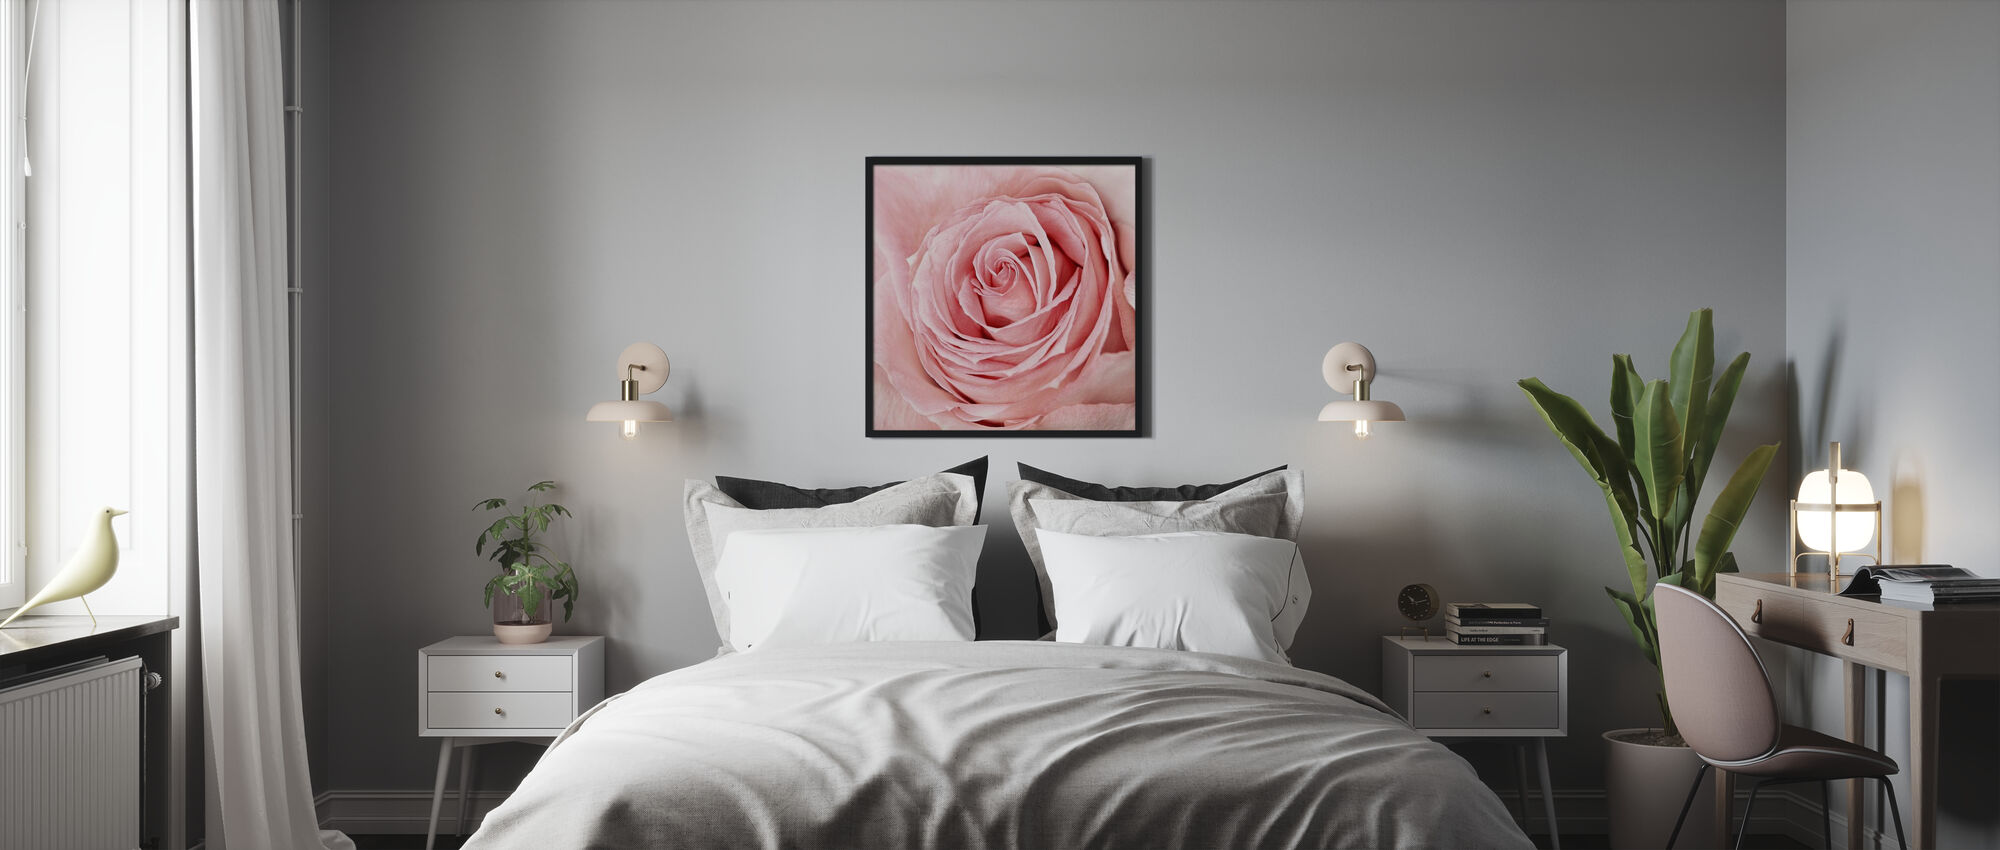 Solitary - Framed print - Bedroom